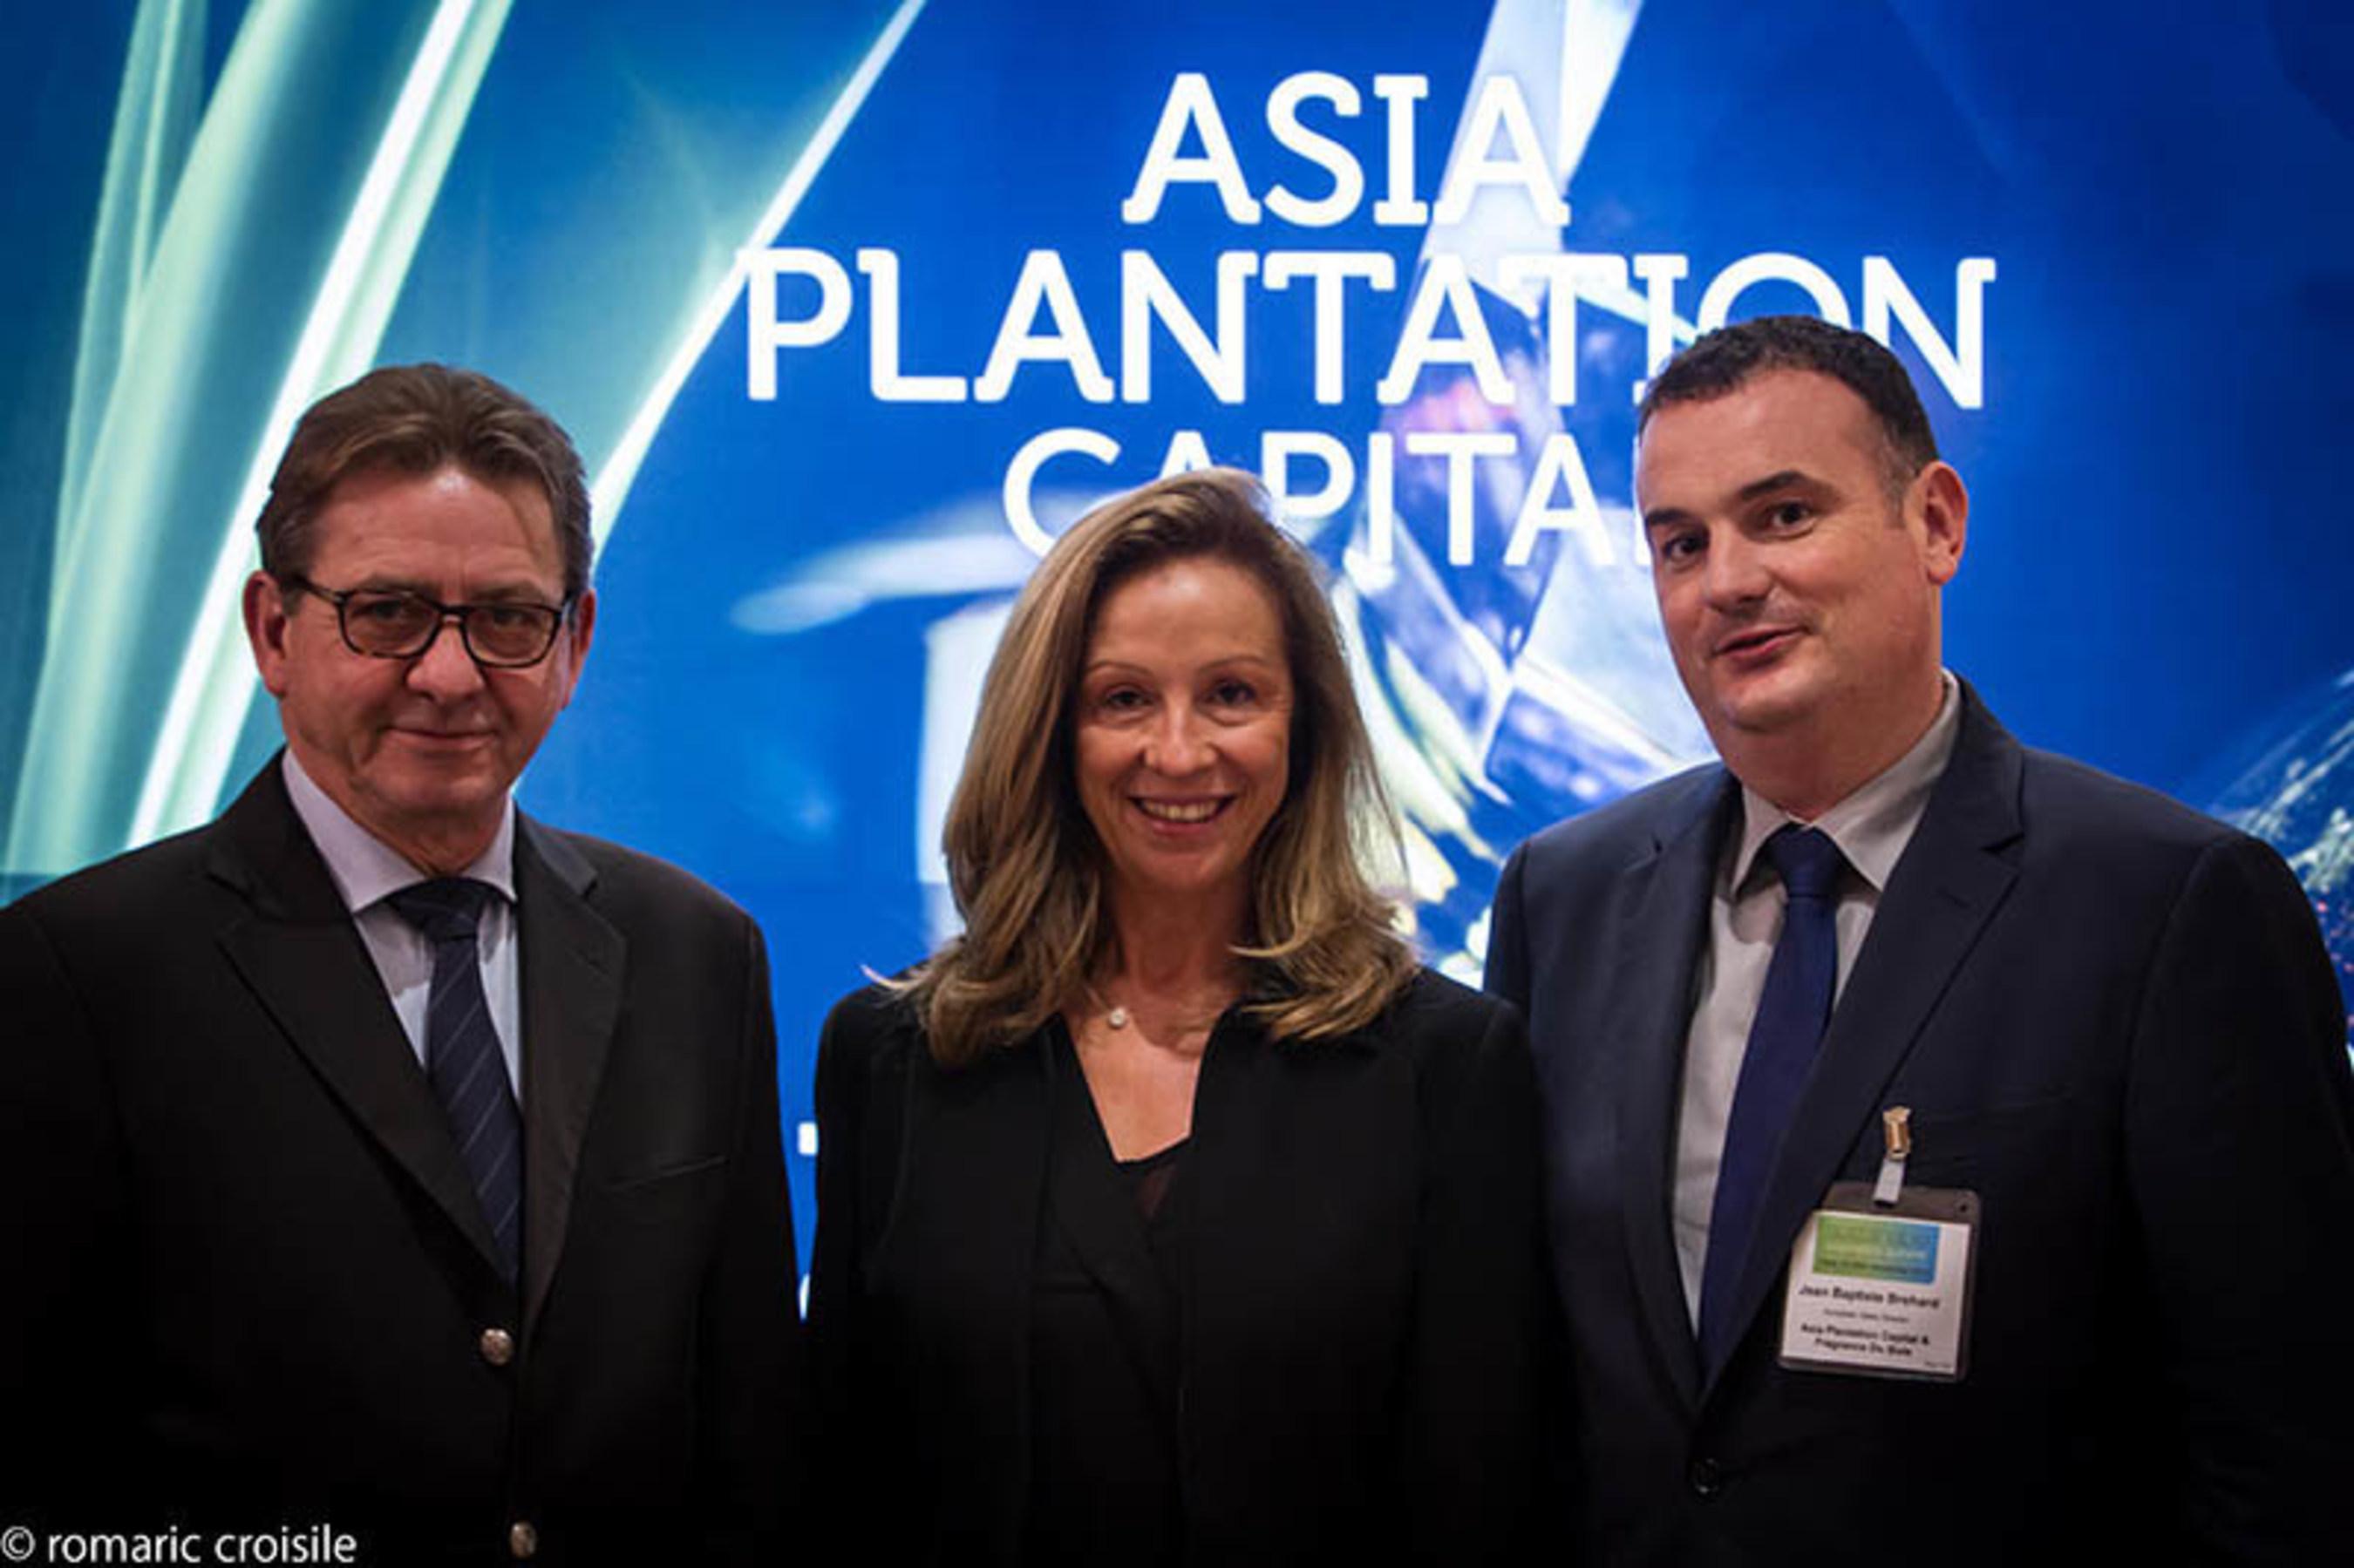 Asia Plantation Capital bei diesjährigen Sustainable Beauty Awards unter den besten Vier